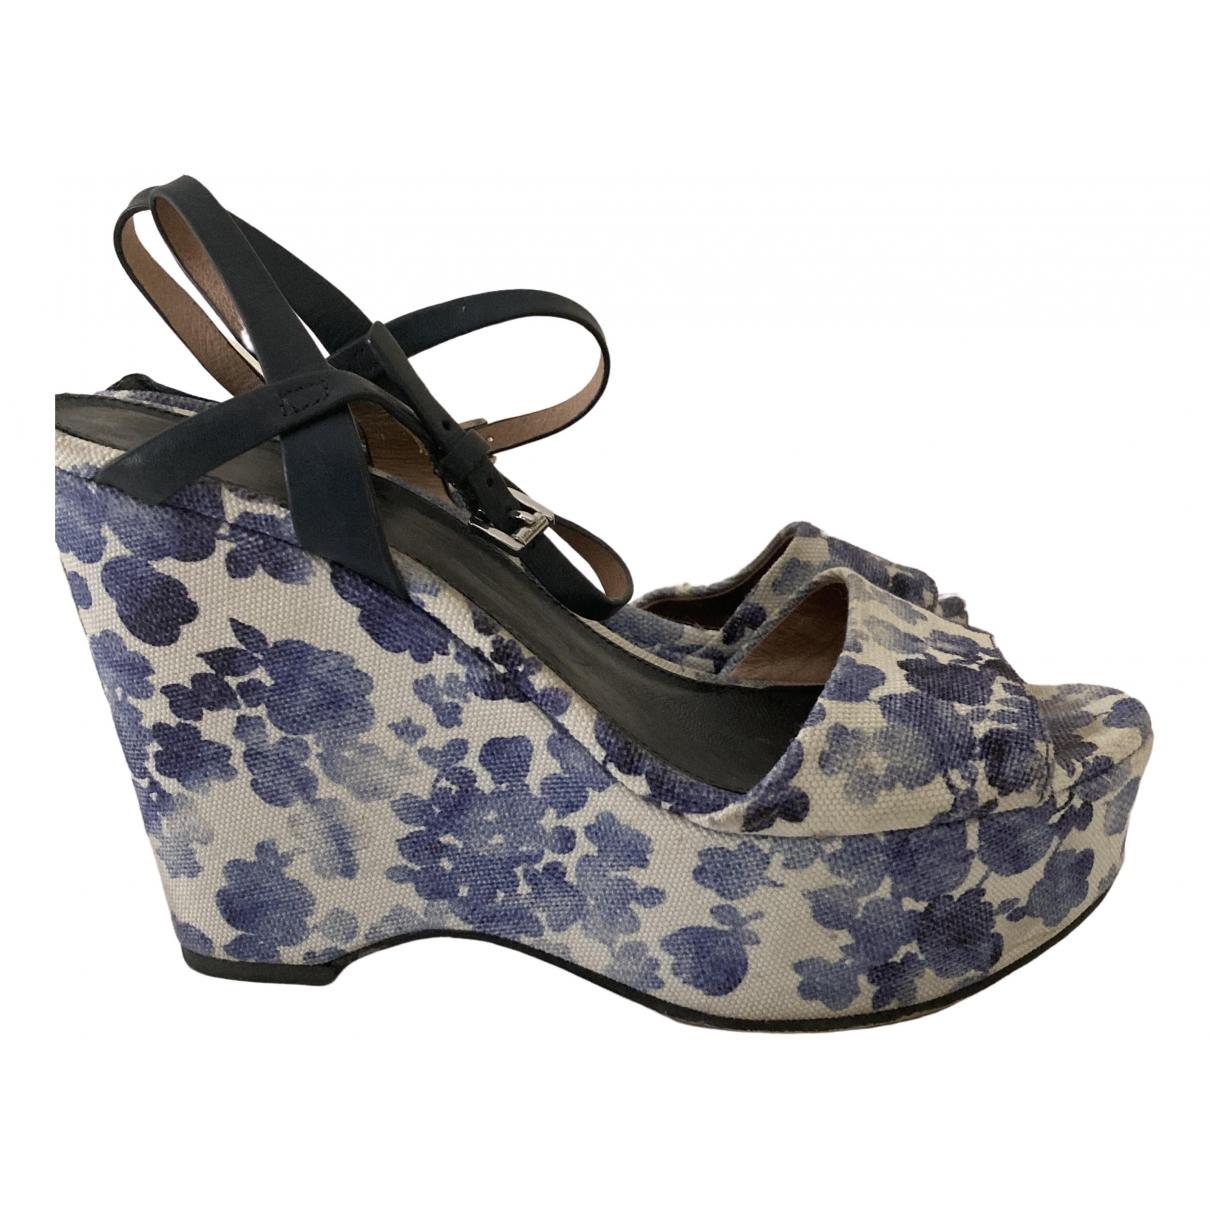 Michael Kors \N Multicolour Leather Heels for Women 39 EU